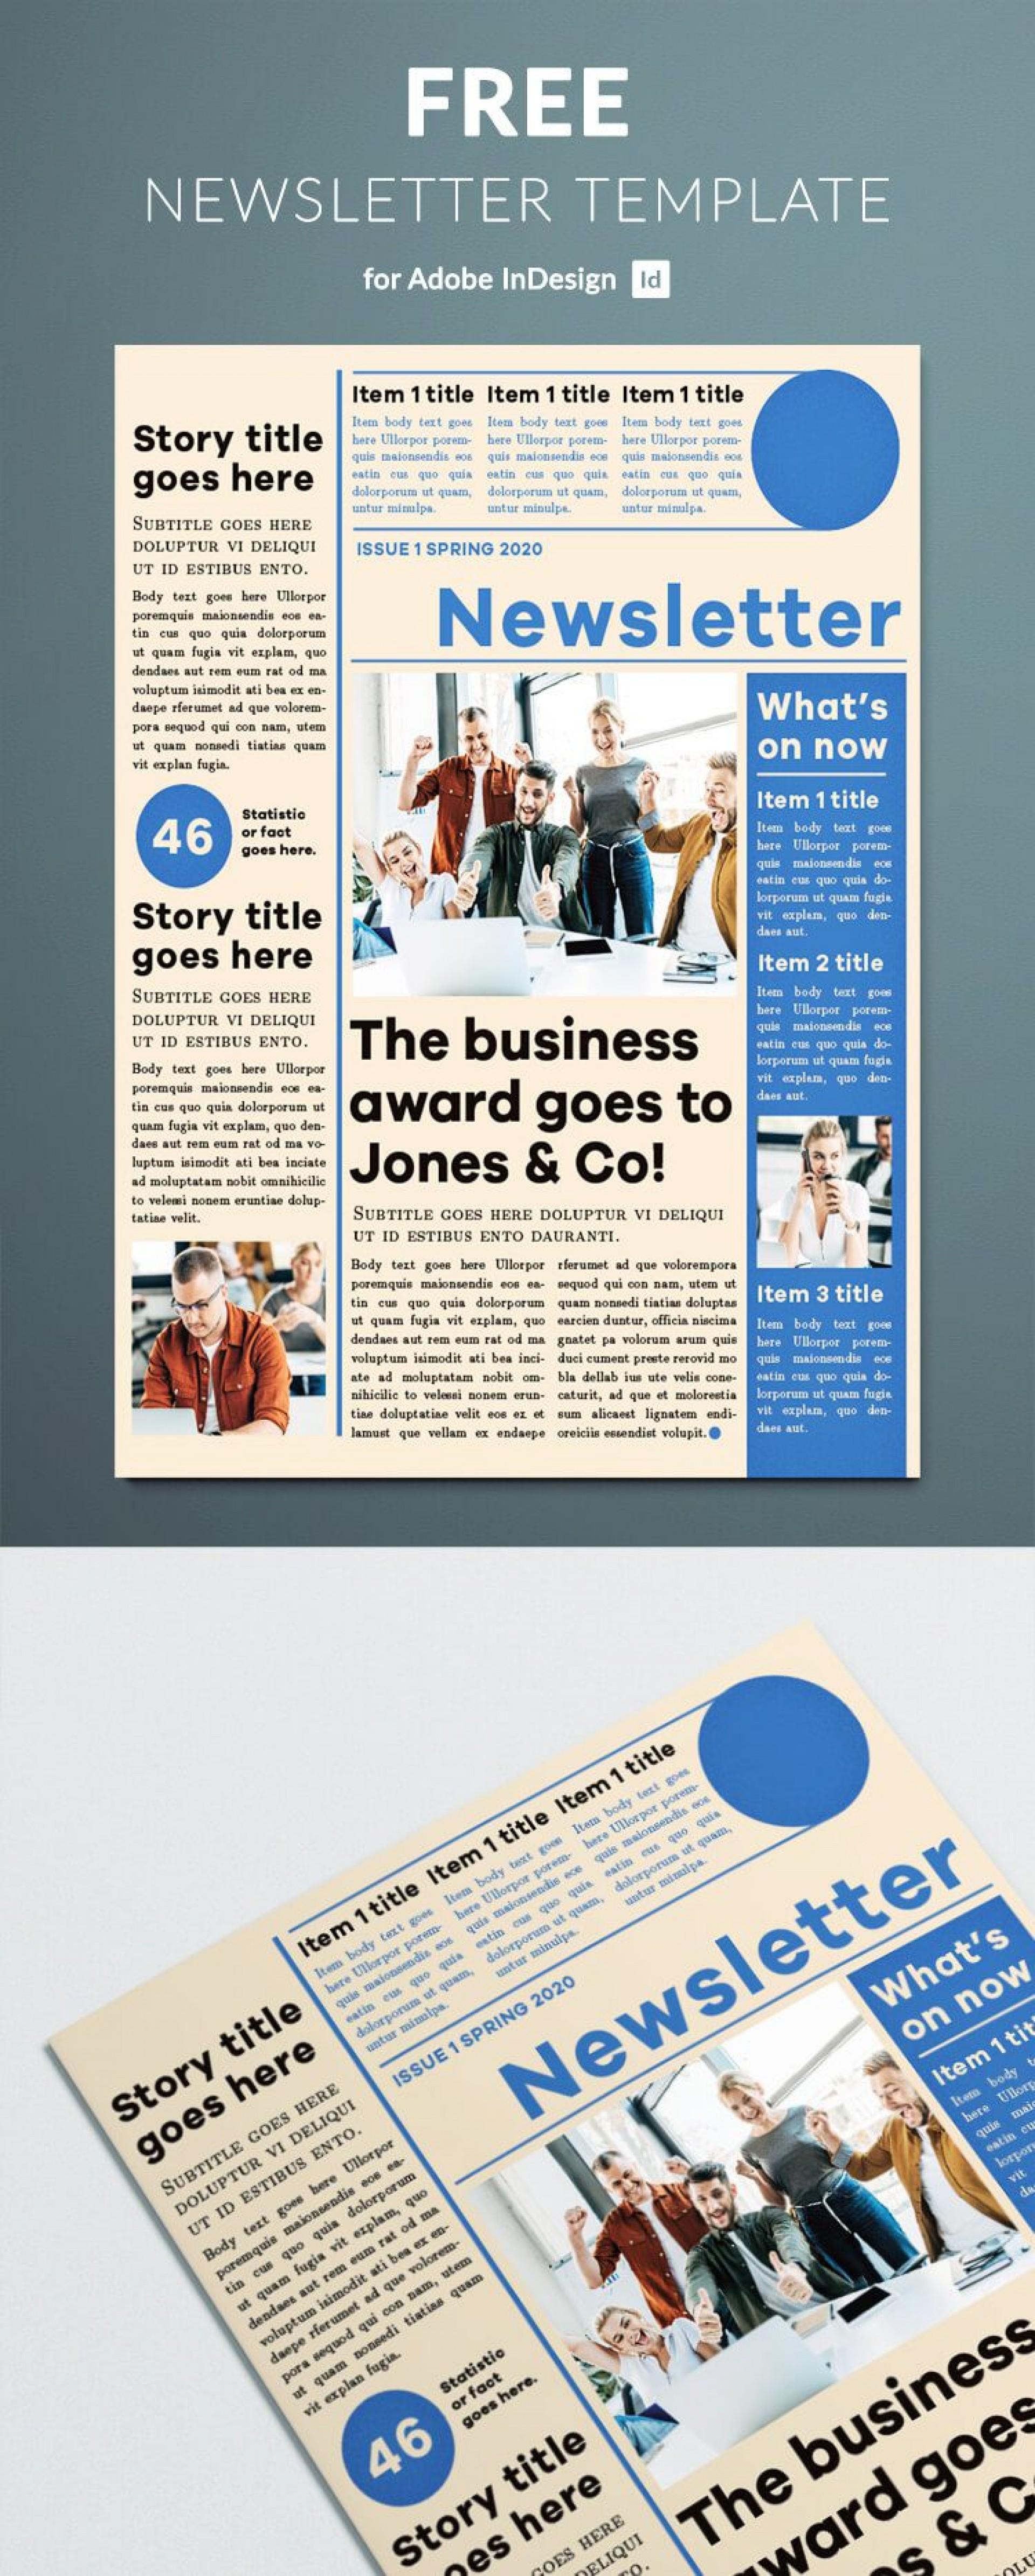 007 Stunning Adobe Indesign Newsletter Template Free Download Inspiration 1920